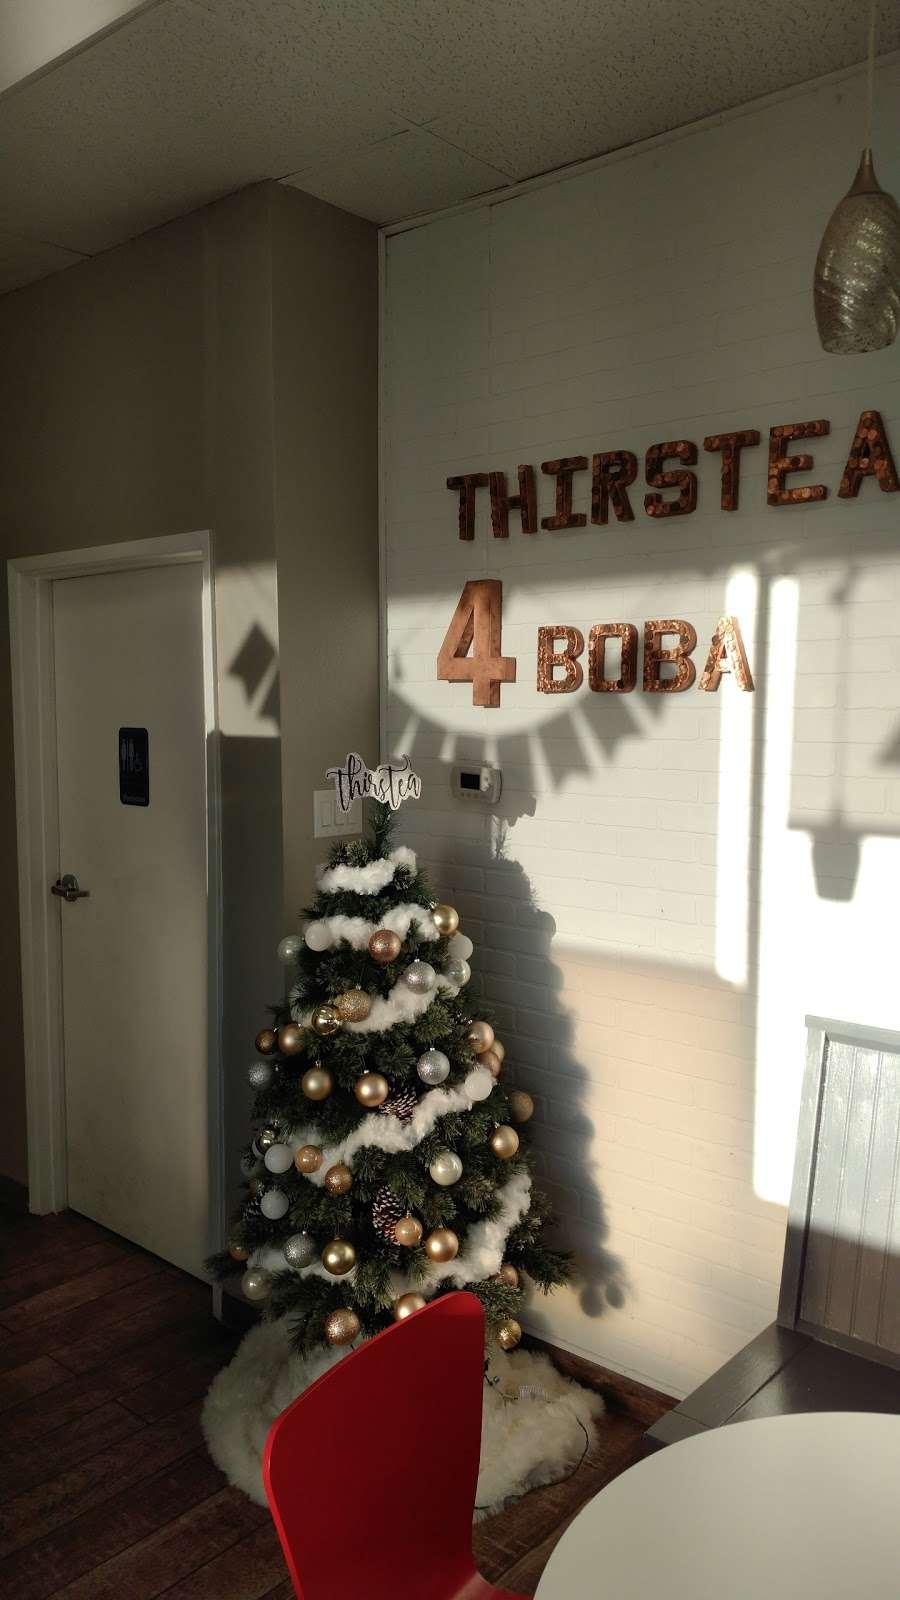 ThirsTea - cafe    Photo 4 of 10   Address: 6585 Commerce Blvd, Rohnert Park, CA 94928, USA   Phone: (707) 303-7868